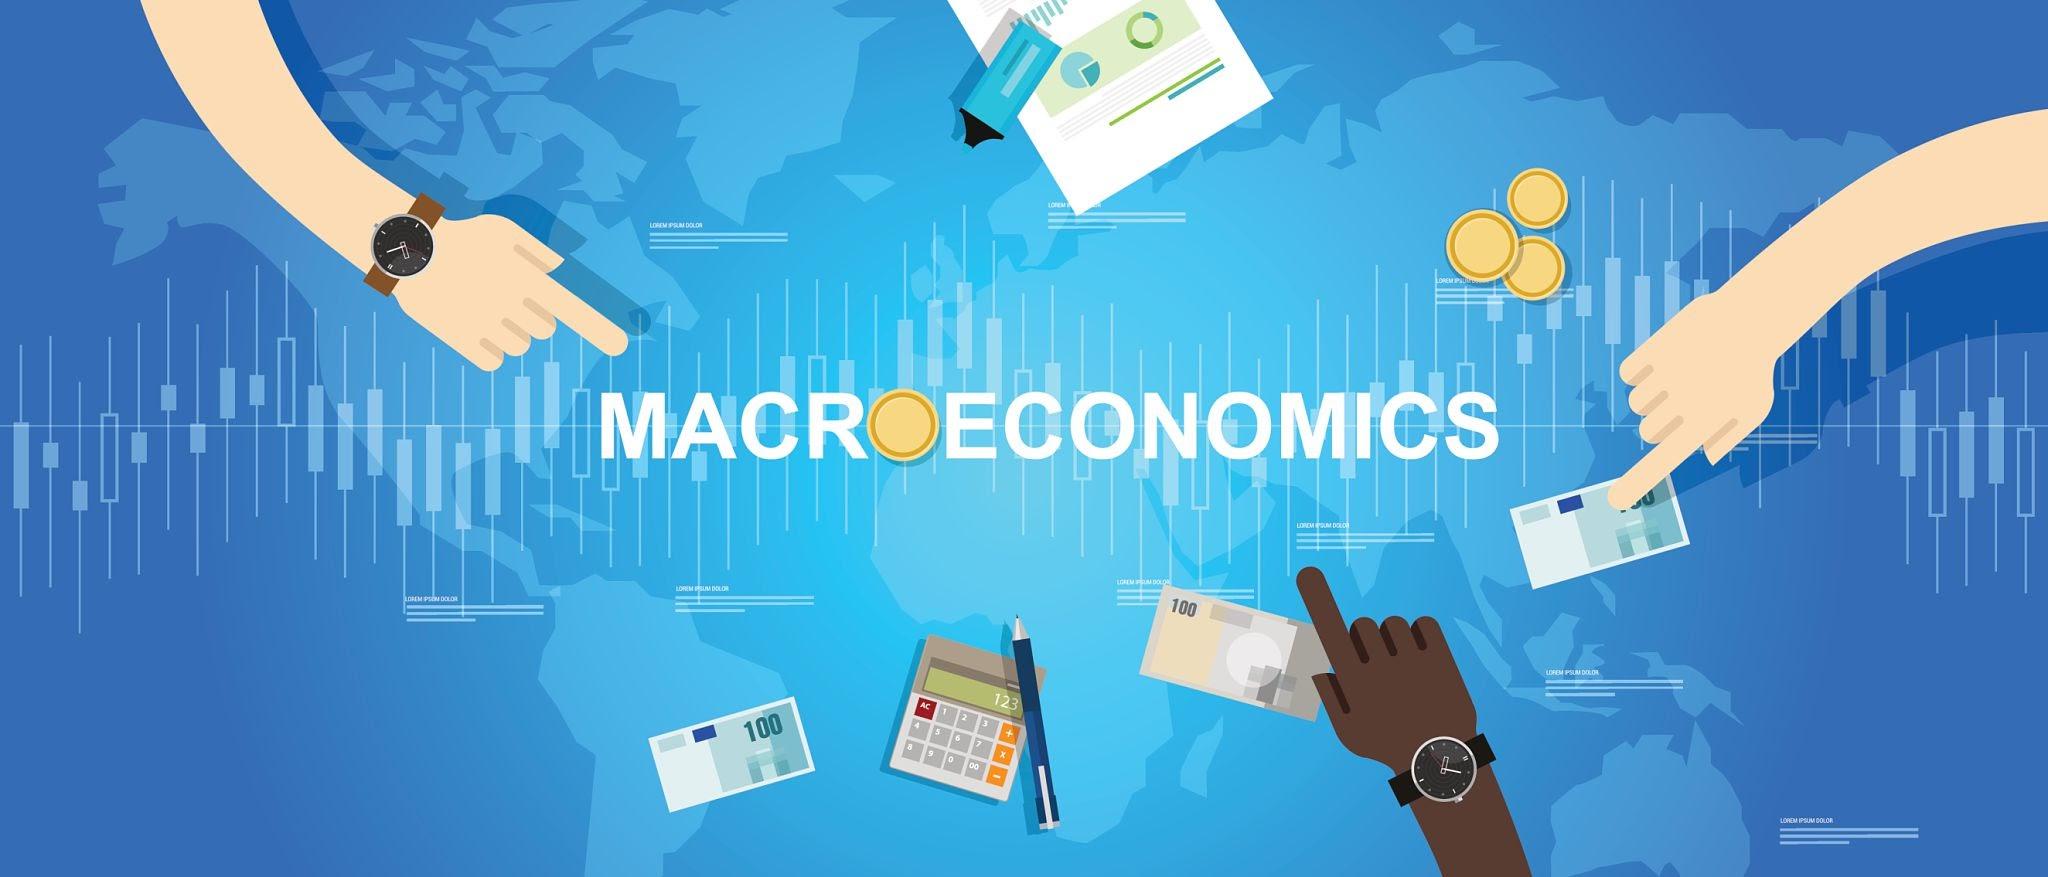 DPB20033 - MACROECONOMICS JUN 2020